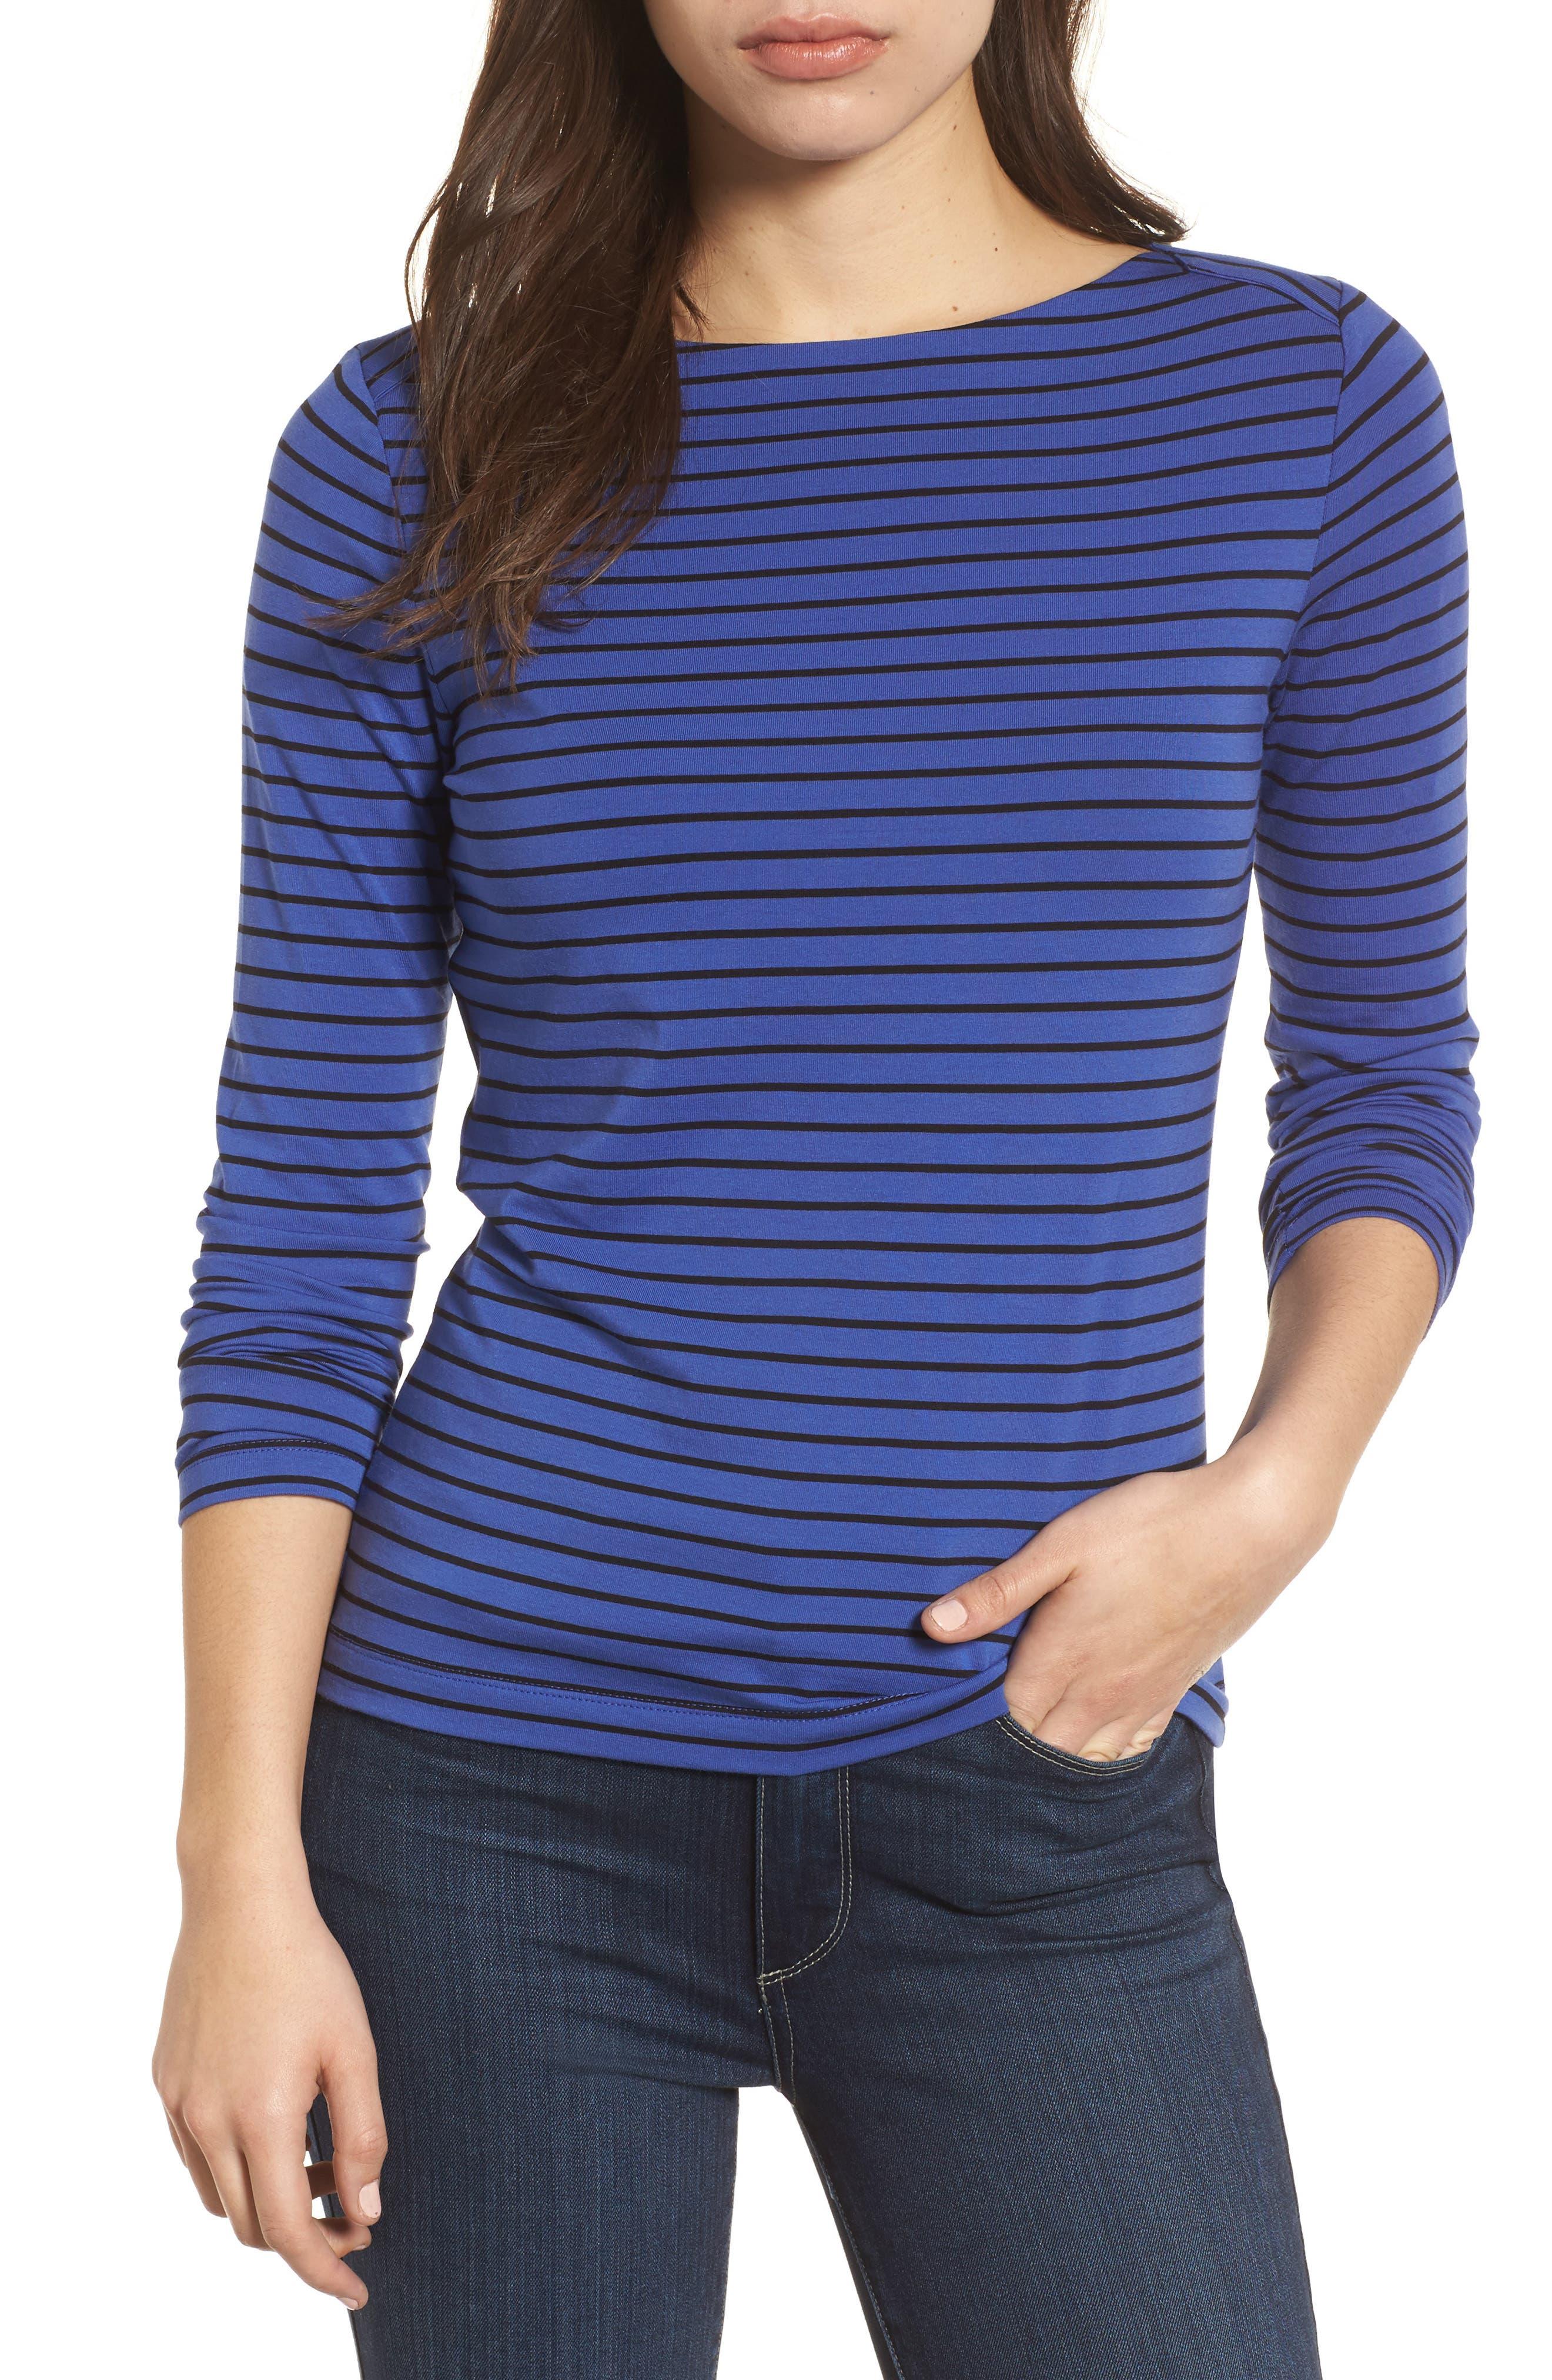 Stripe Knit Boatneck Top,                             Main thumbnail 1, color,                             Okeeffe Blue/ Black